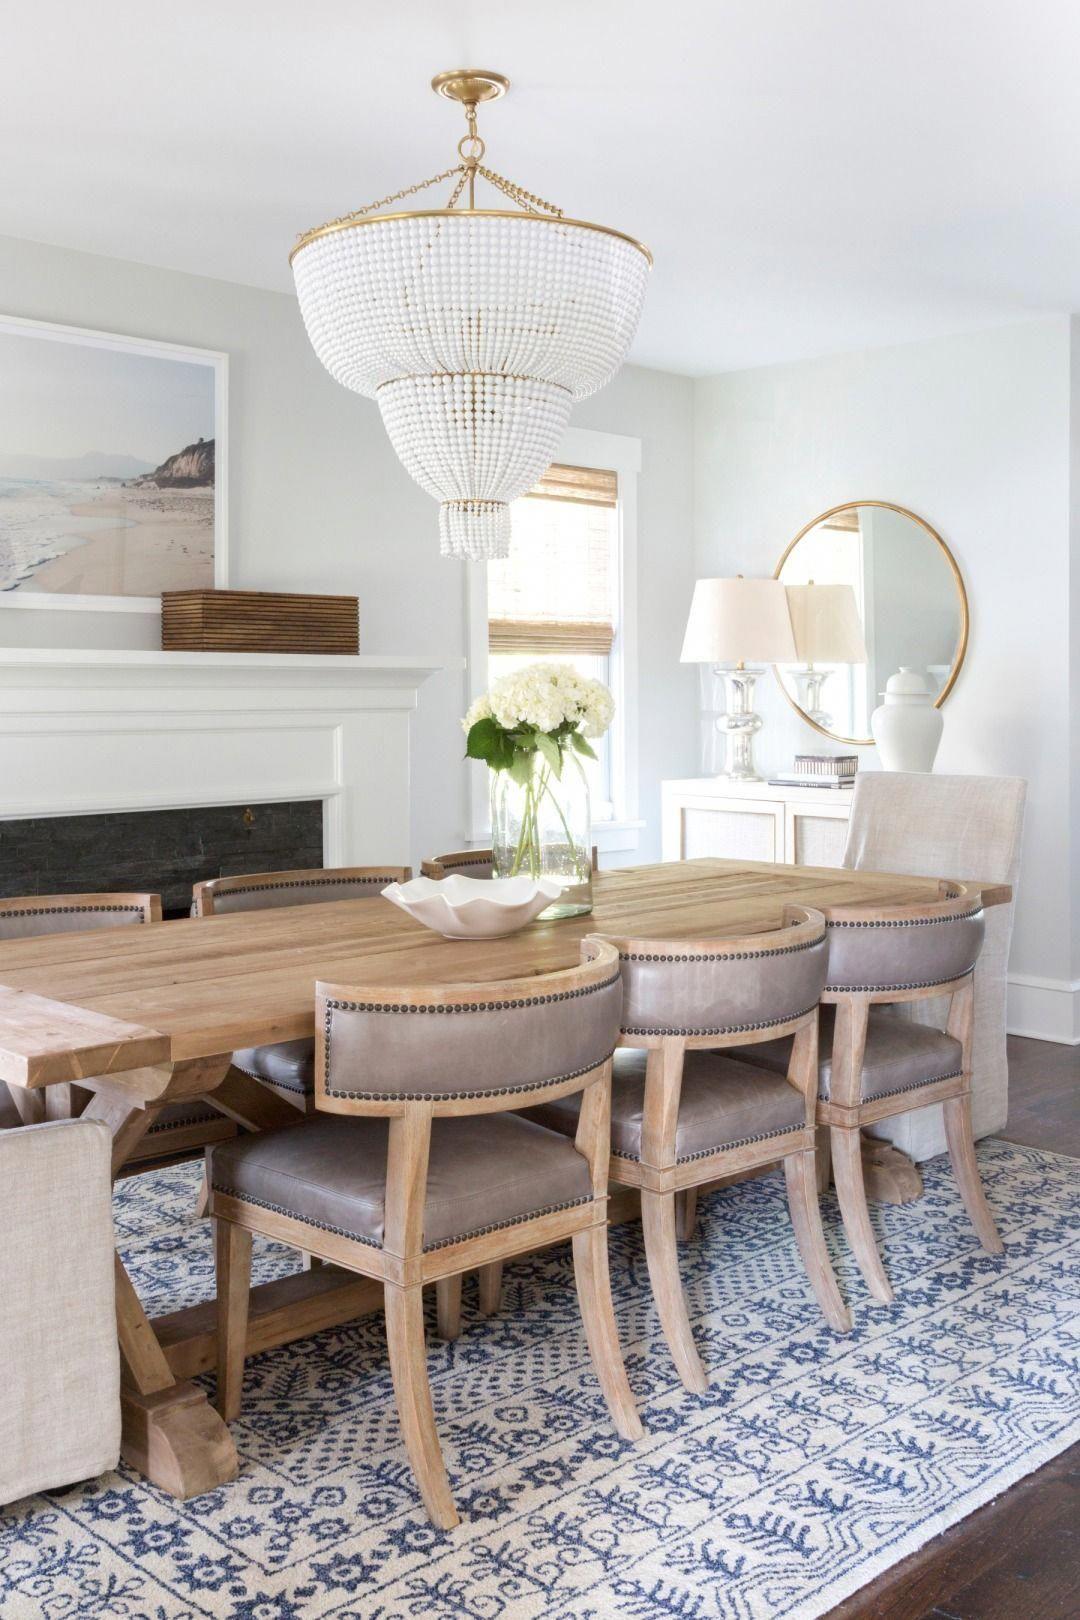 Haddonfield project studio mcgee diningroomdecorating dining